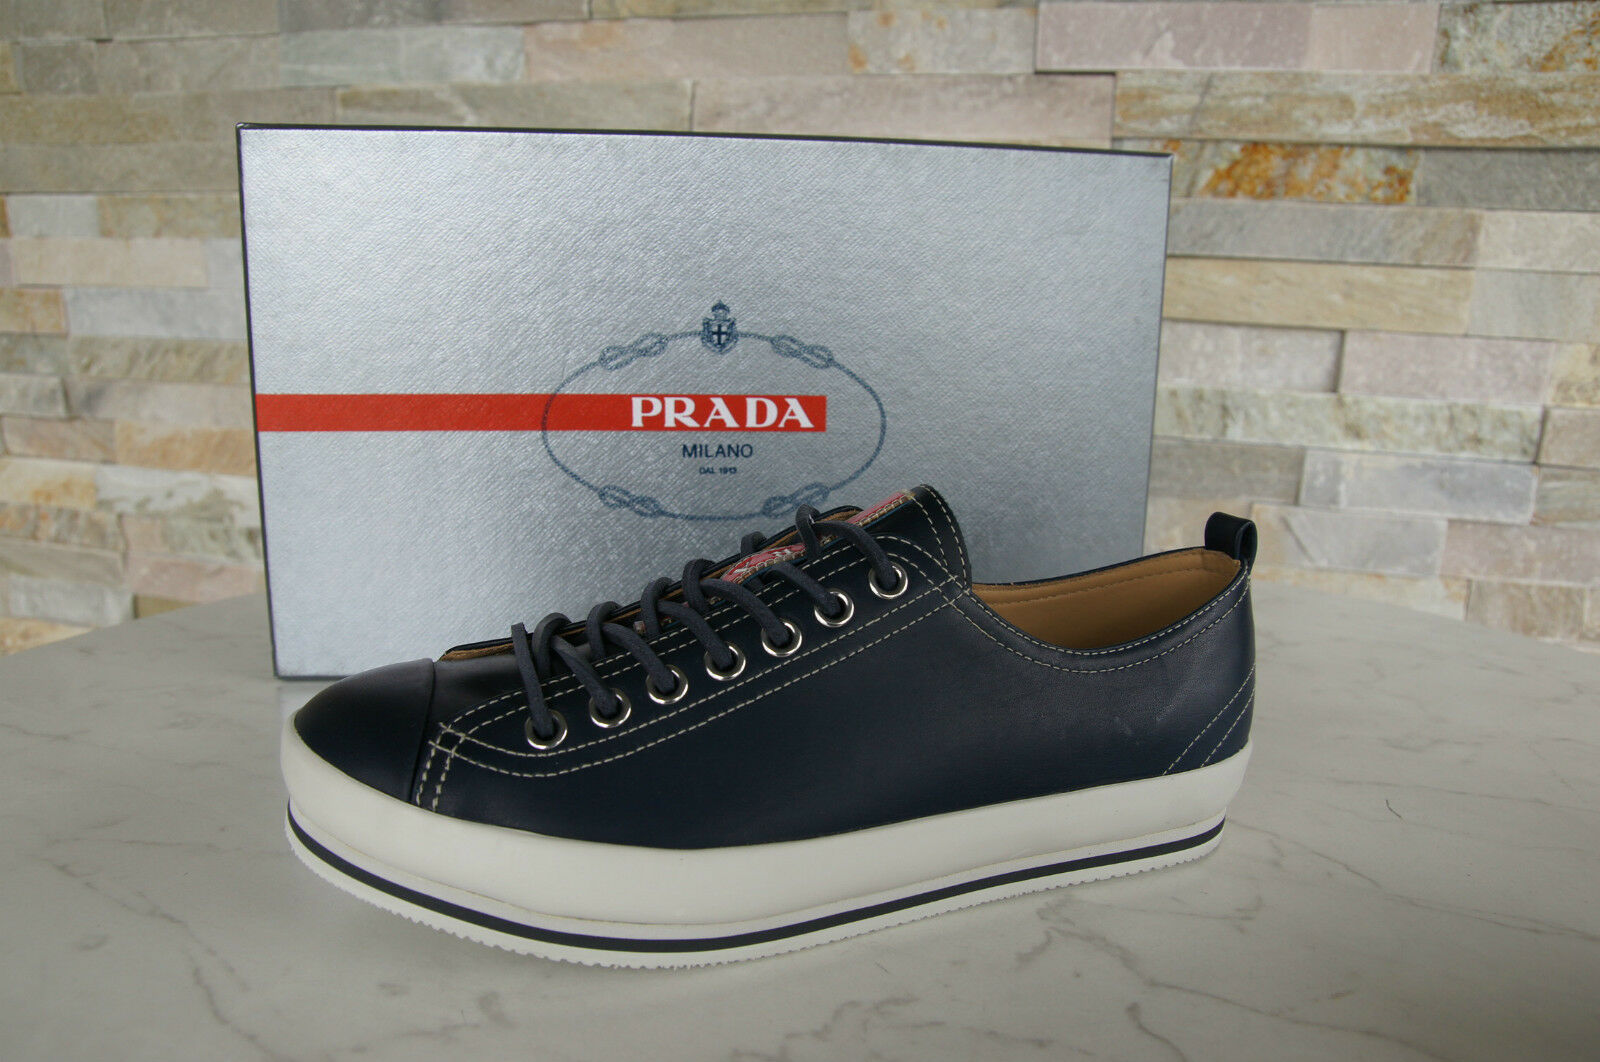 Prada Gr 39,5  5,5 Sneakers Schnürschuhe Schuhe Shoes blue + white NEU UVP 295